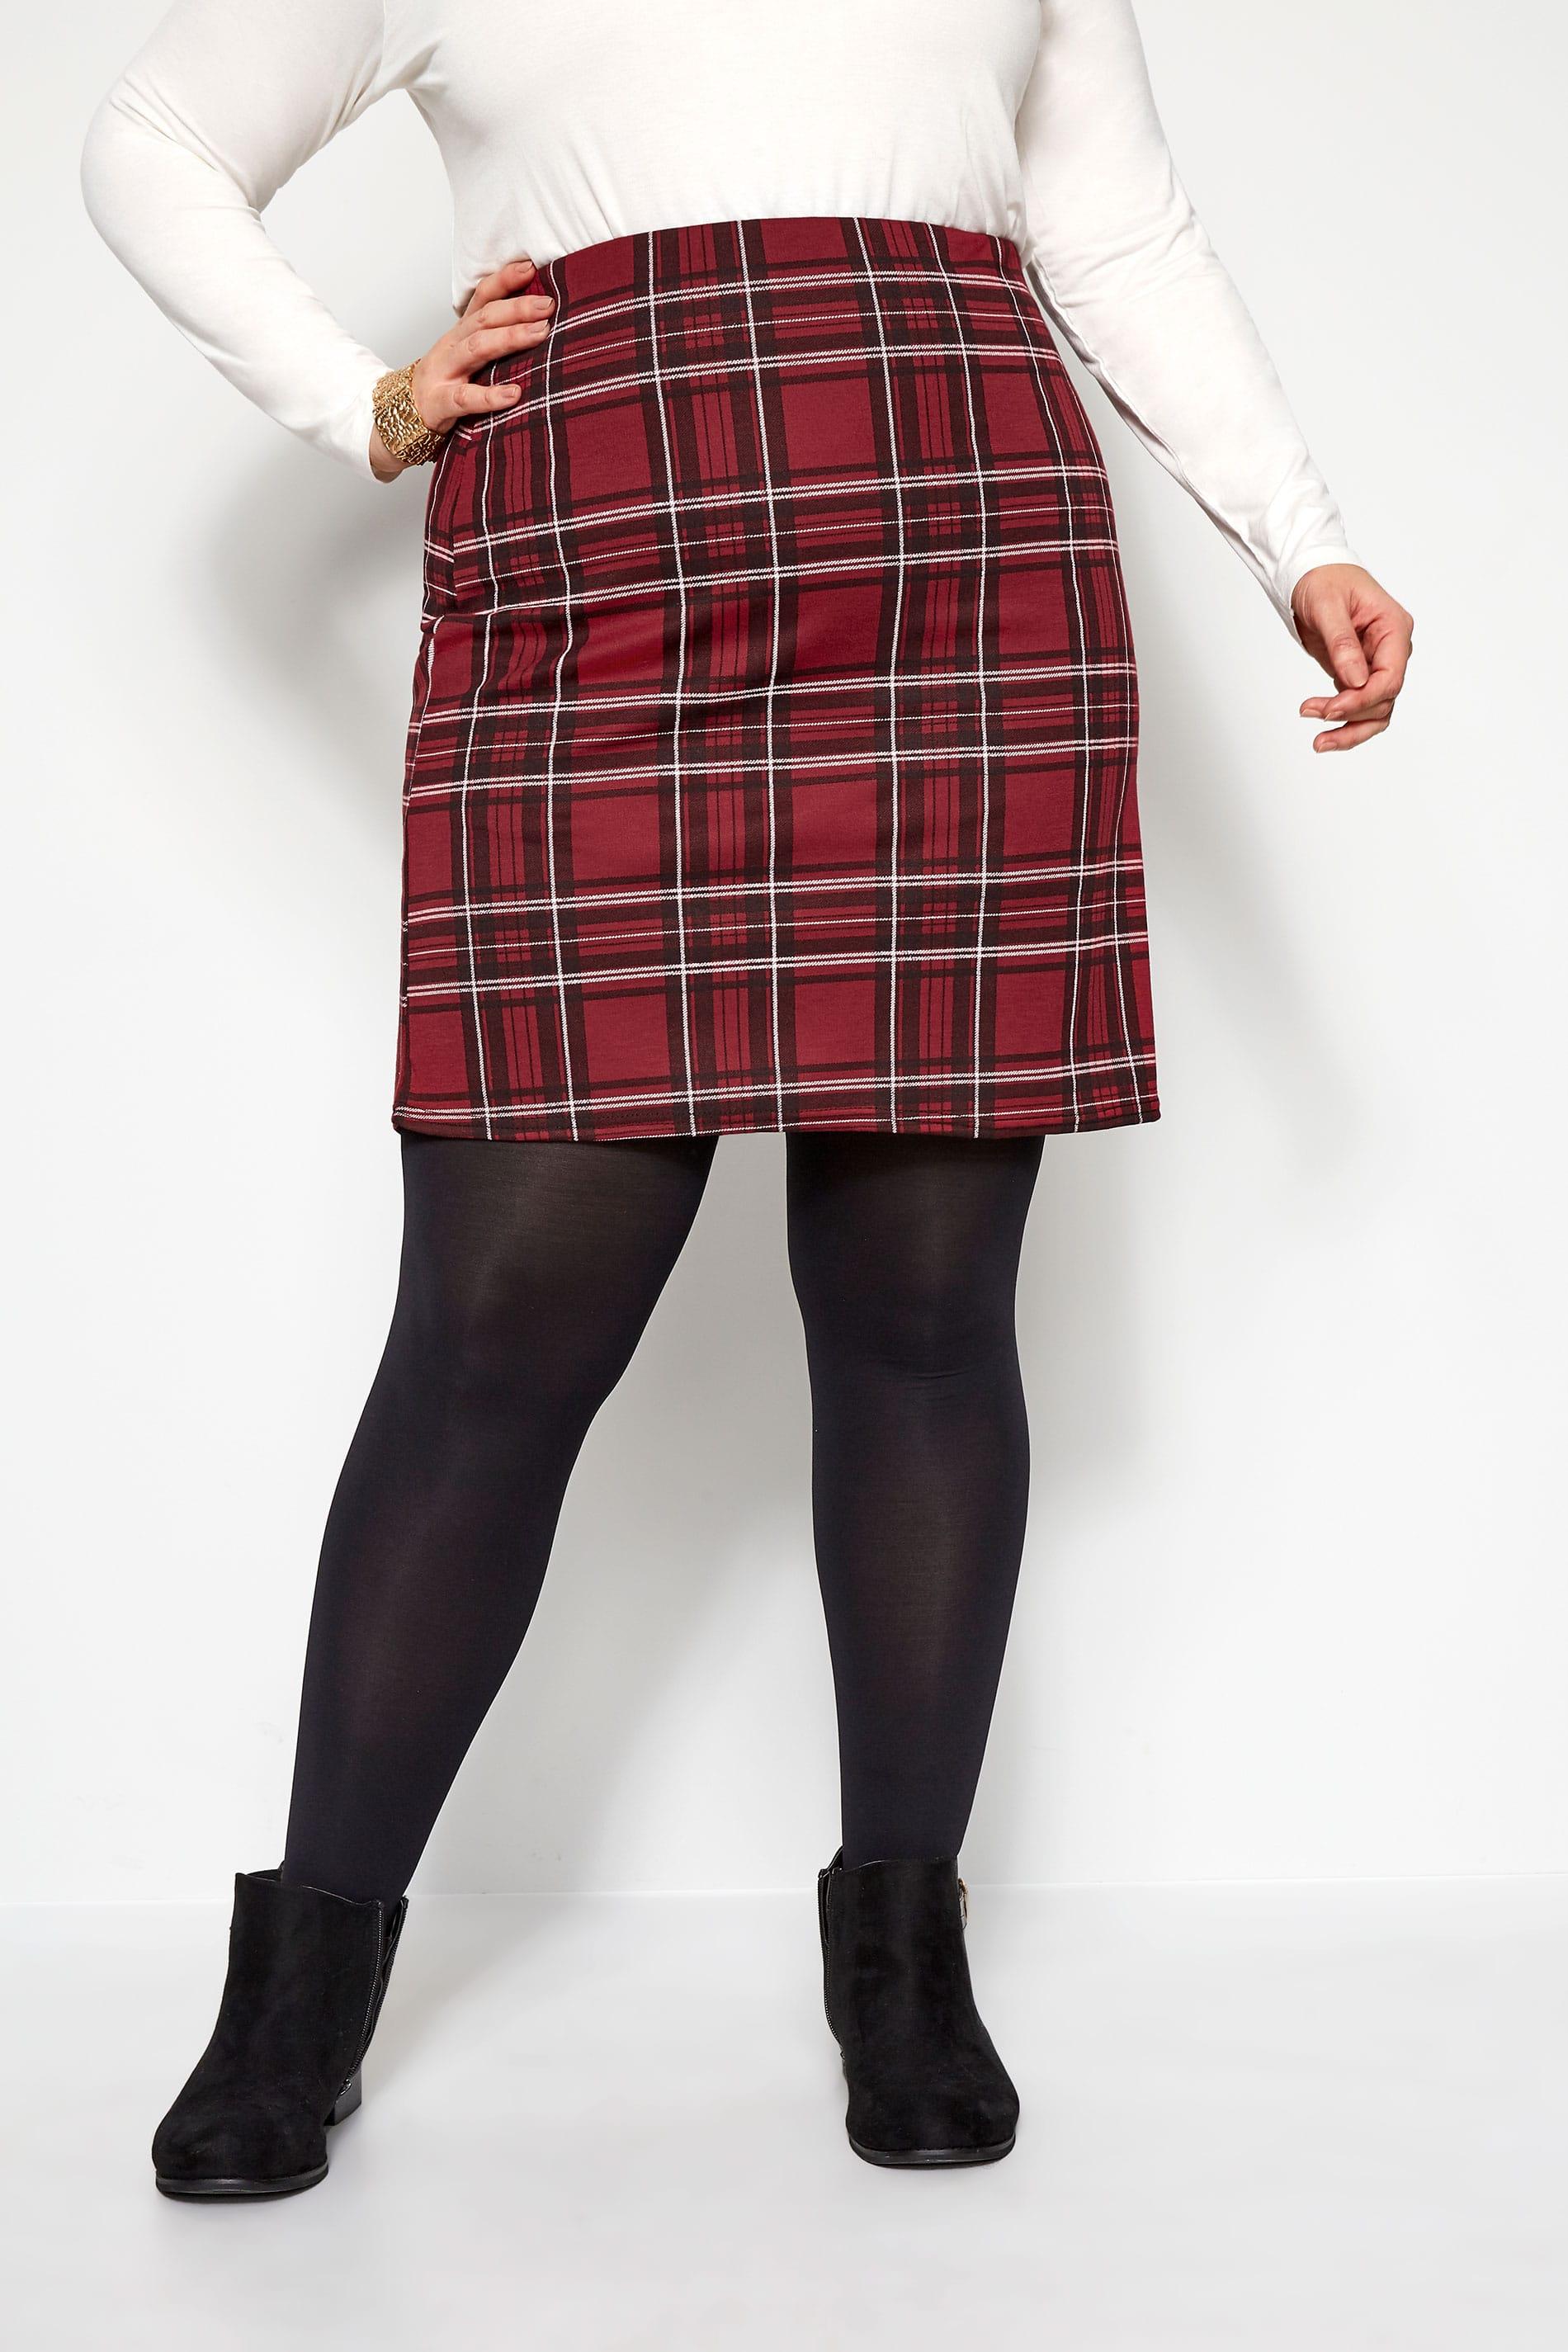 Spódnica mini w kratę, bordo